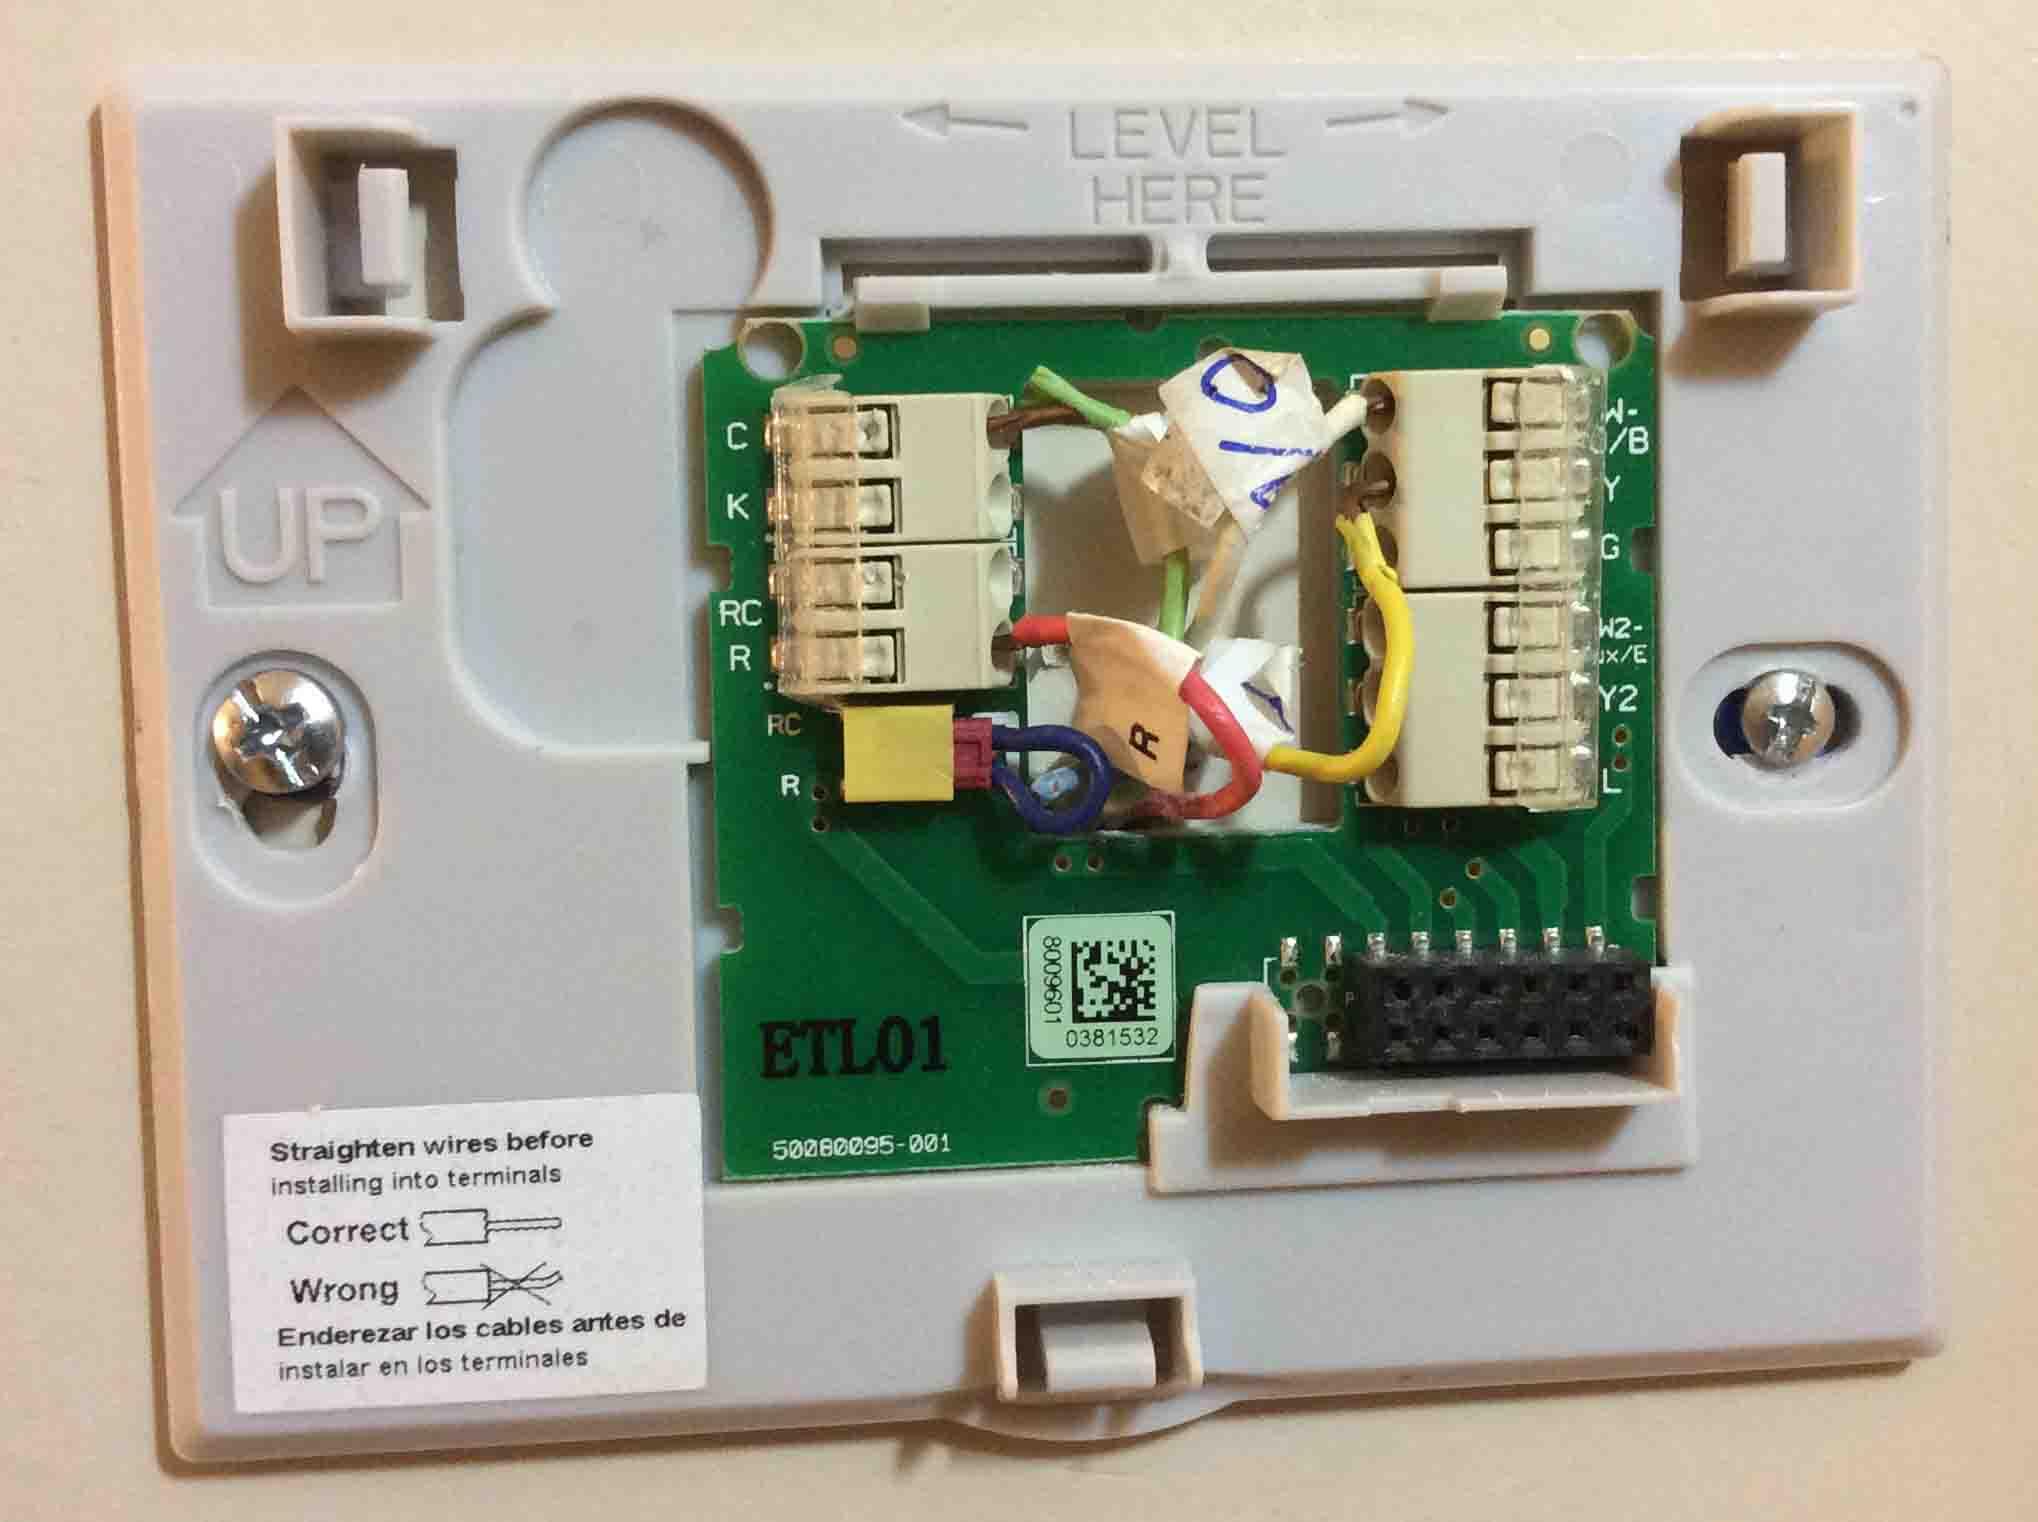 HoneywellSmartThermostatRTH9580WFWallPlateMountedWiresConnected_001?fit=1200%2C896&ssl=1&resize=350%2C200 honeywell thermostat wiring color code tom's tek stop honeywell t8112d1005 wiring diagram at nearapp.co